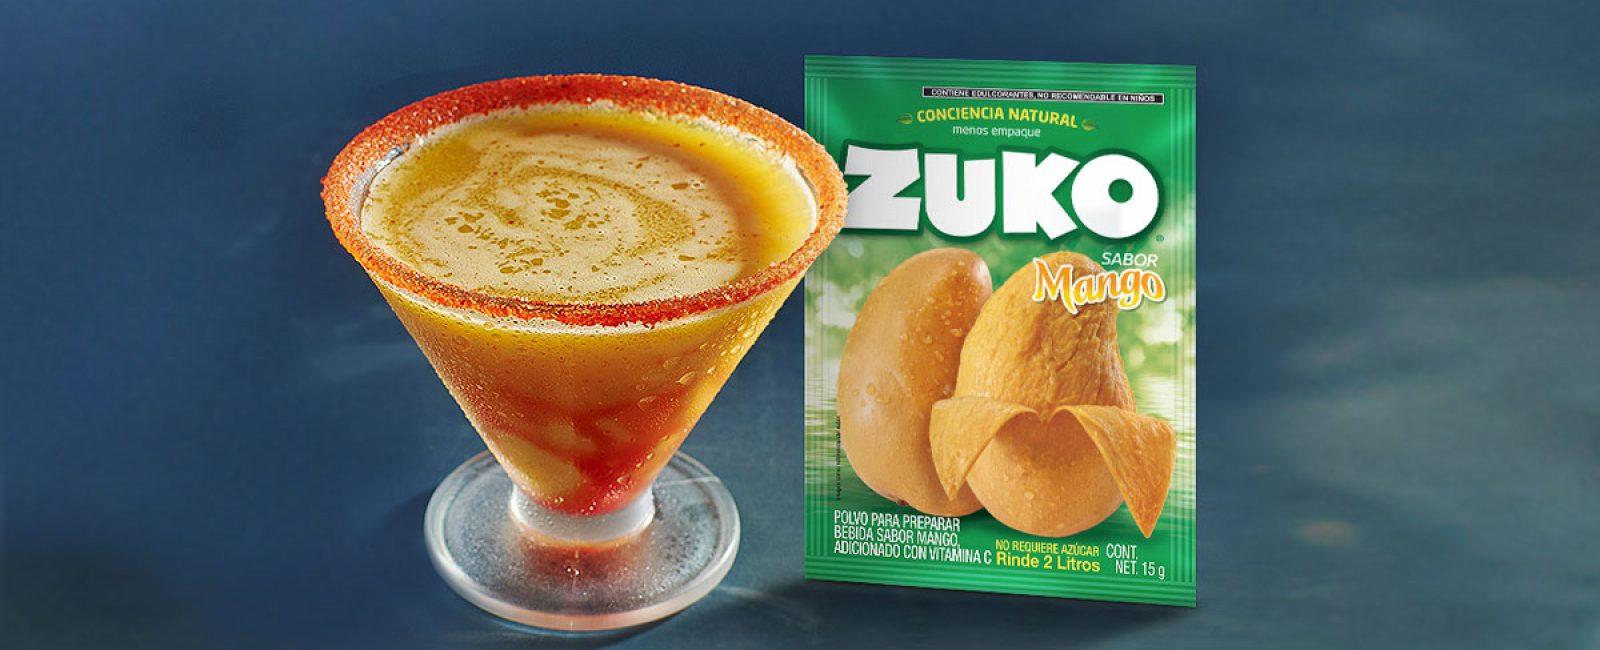 zuko-mango